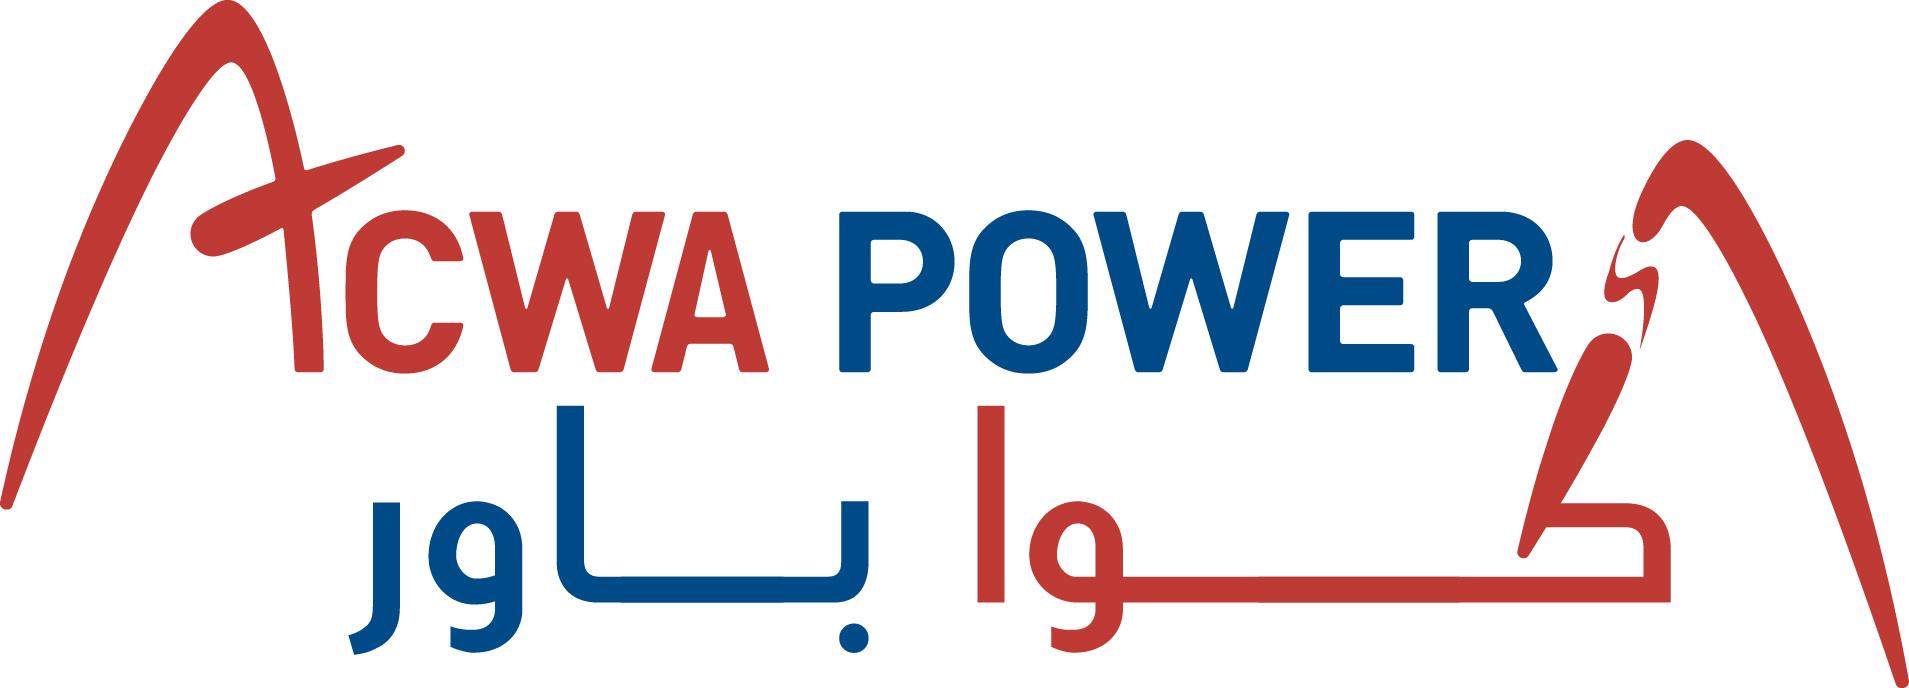 ACWA Power - DUAL LANGUAGE LOGO